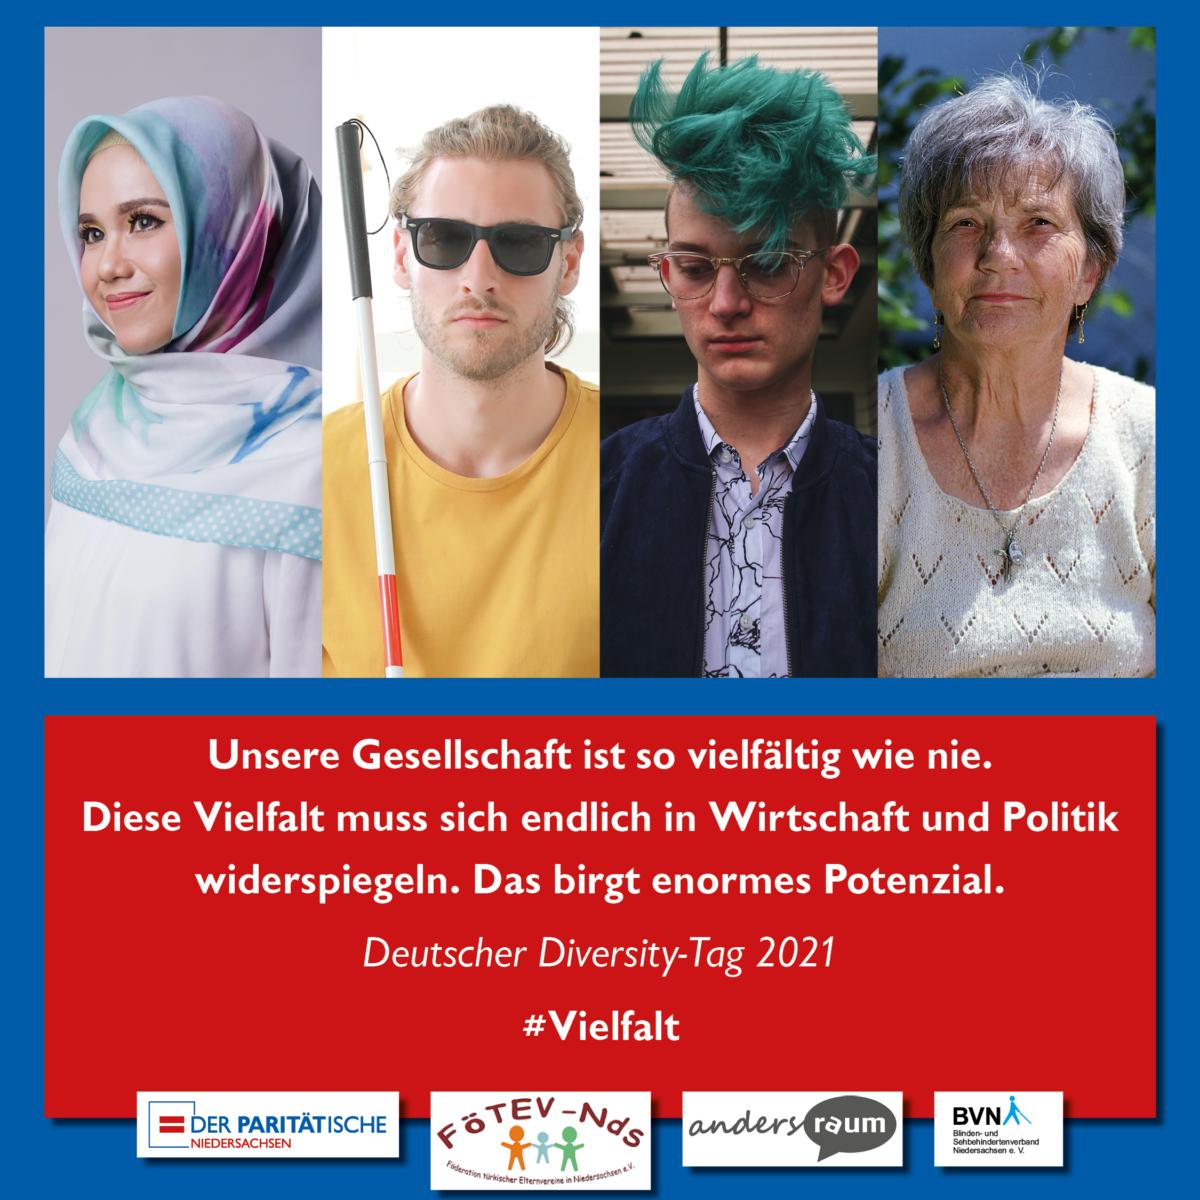 2021-05-17 Diversity-Tag